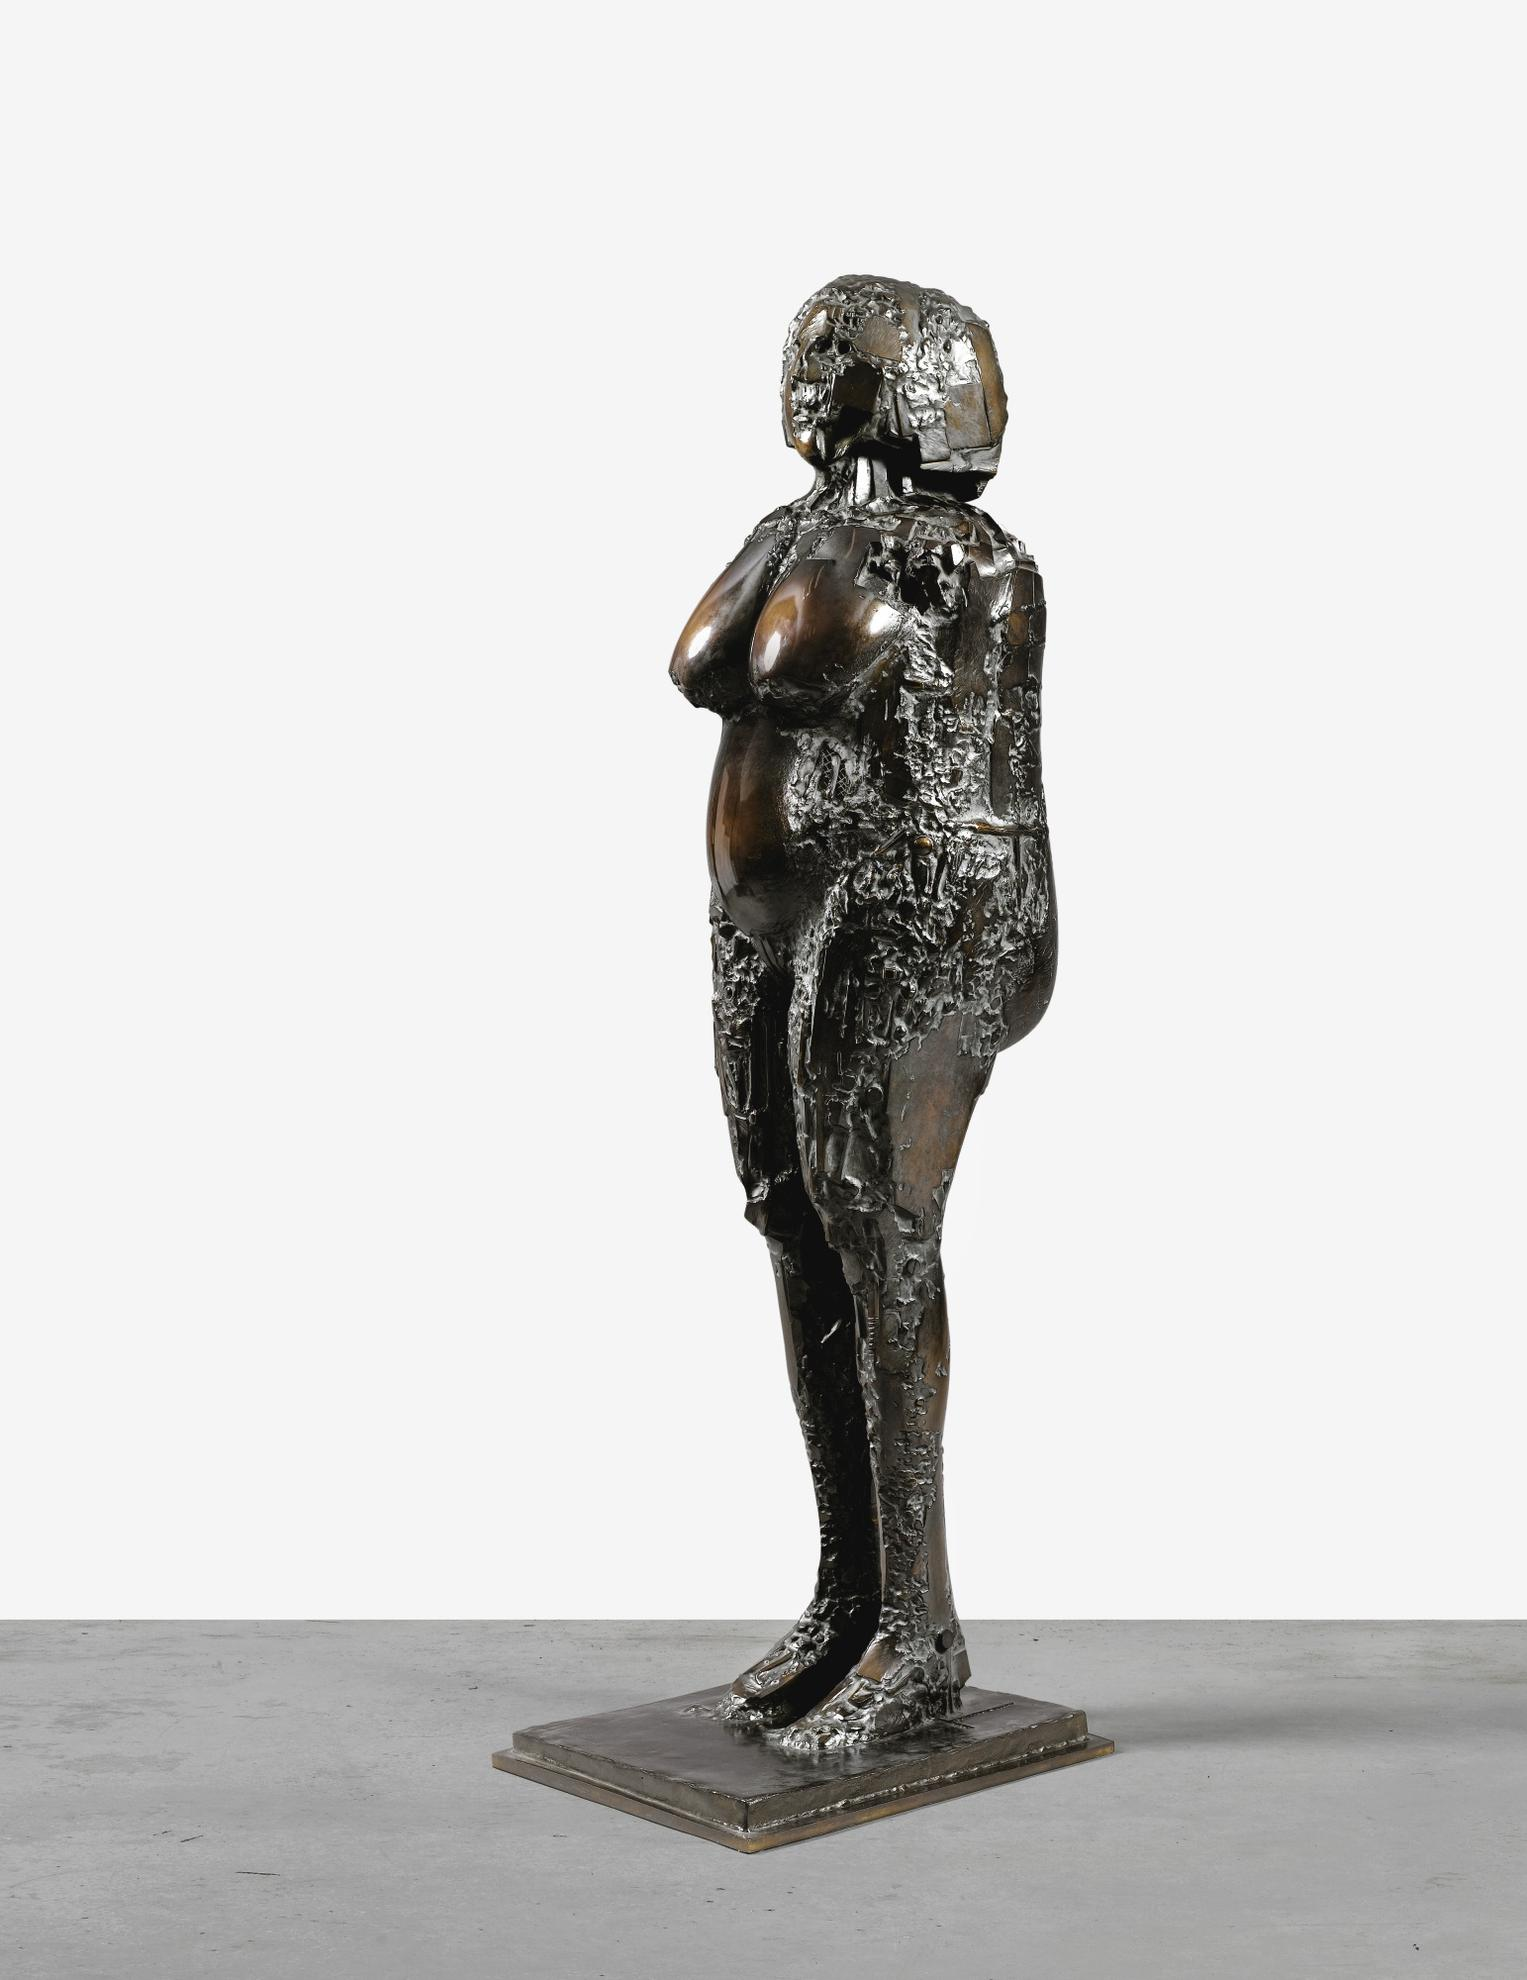 Cesar-La Venus De Villetaneuse-1981